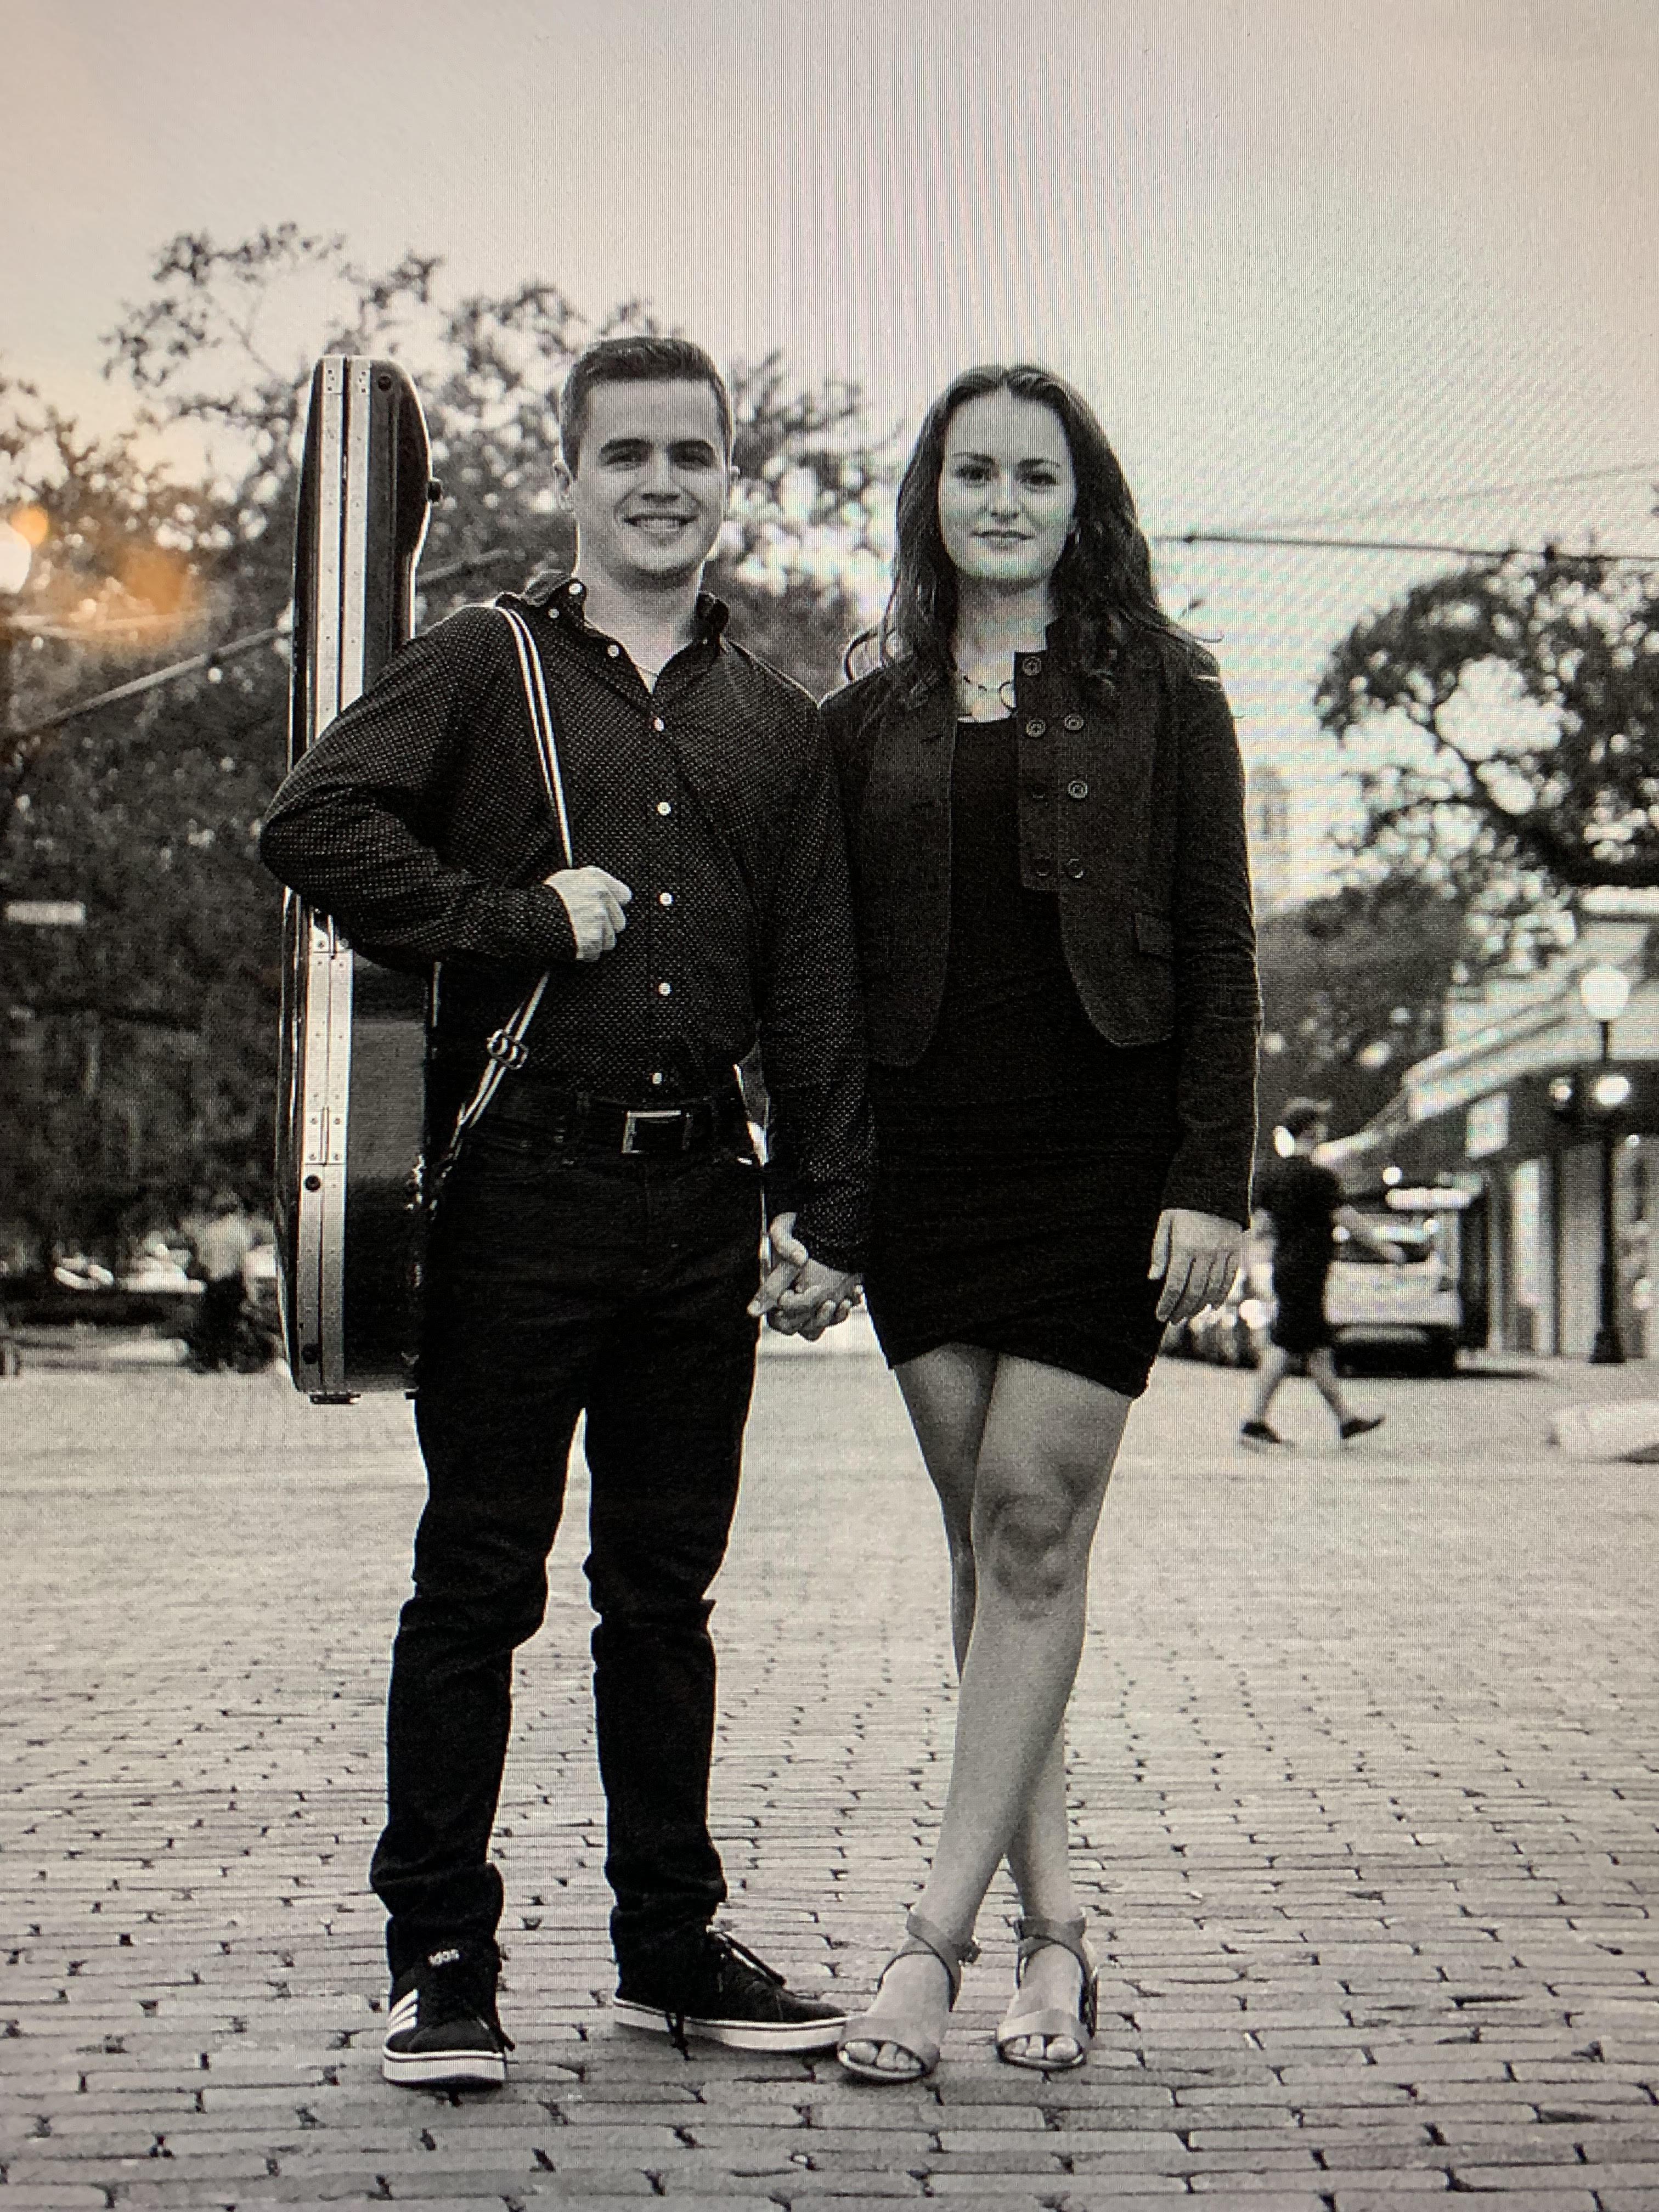 Erik and Giselle at the Vineyard Orlando